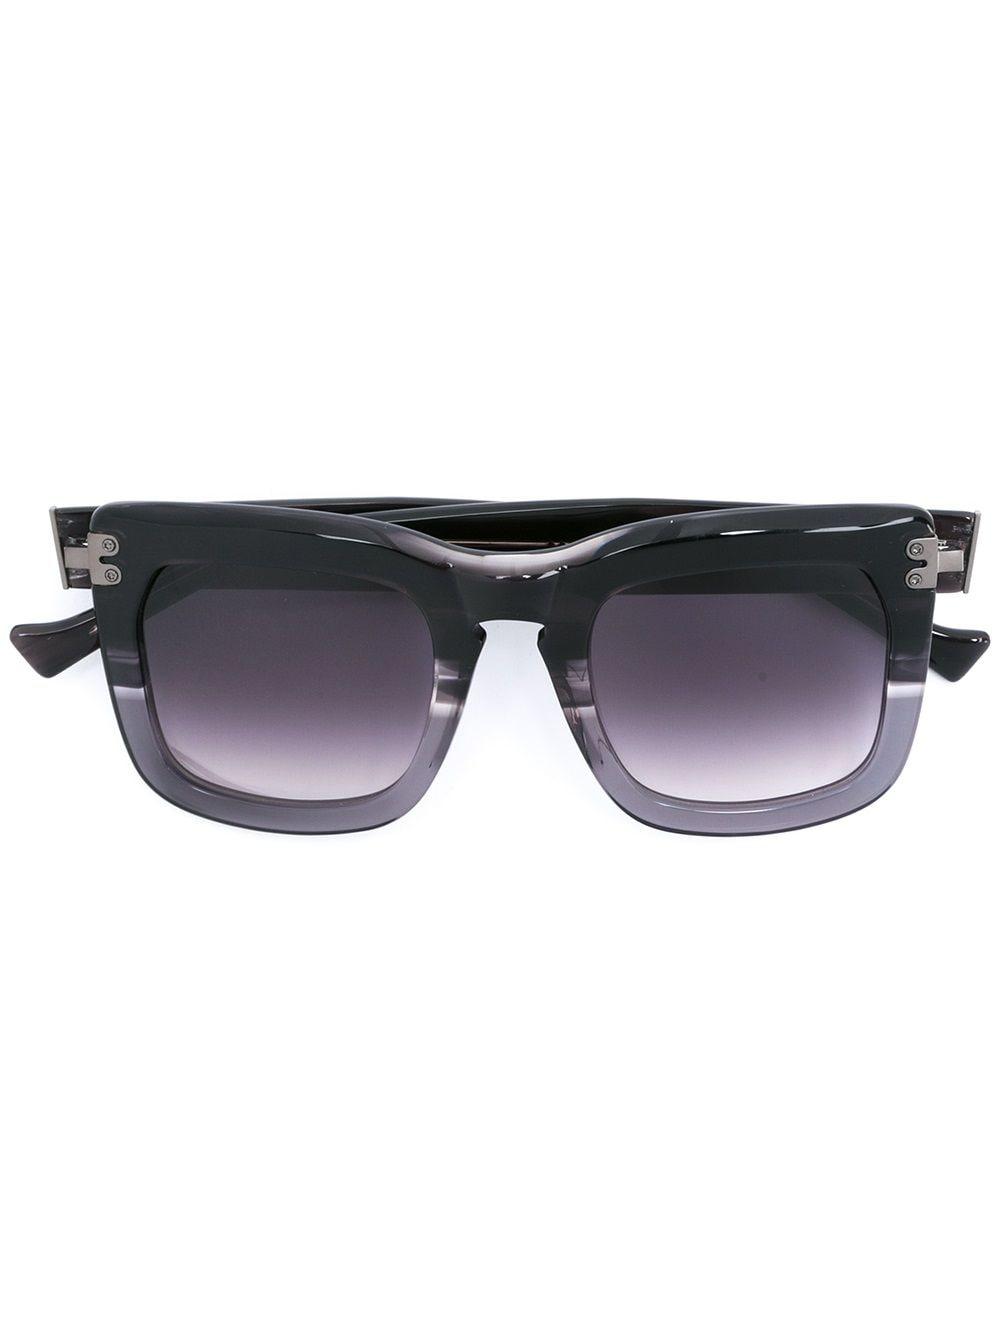 Grey Ant 'Blitz' Sonnenbrille - Grau